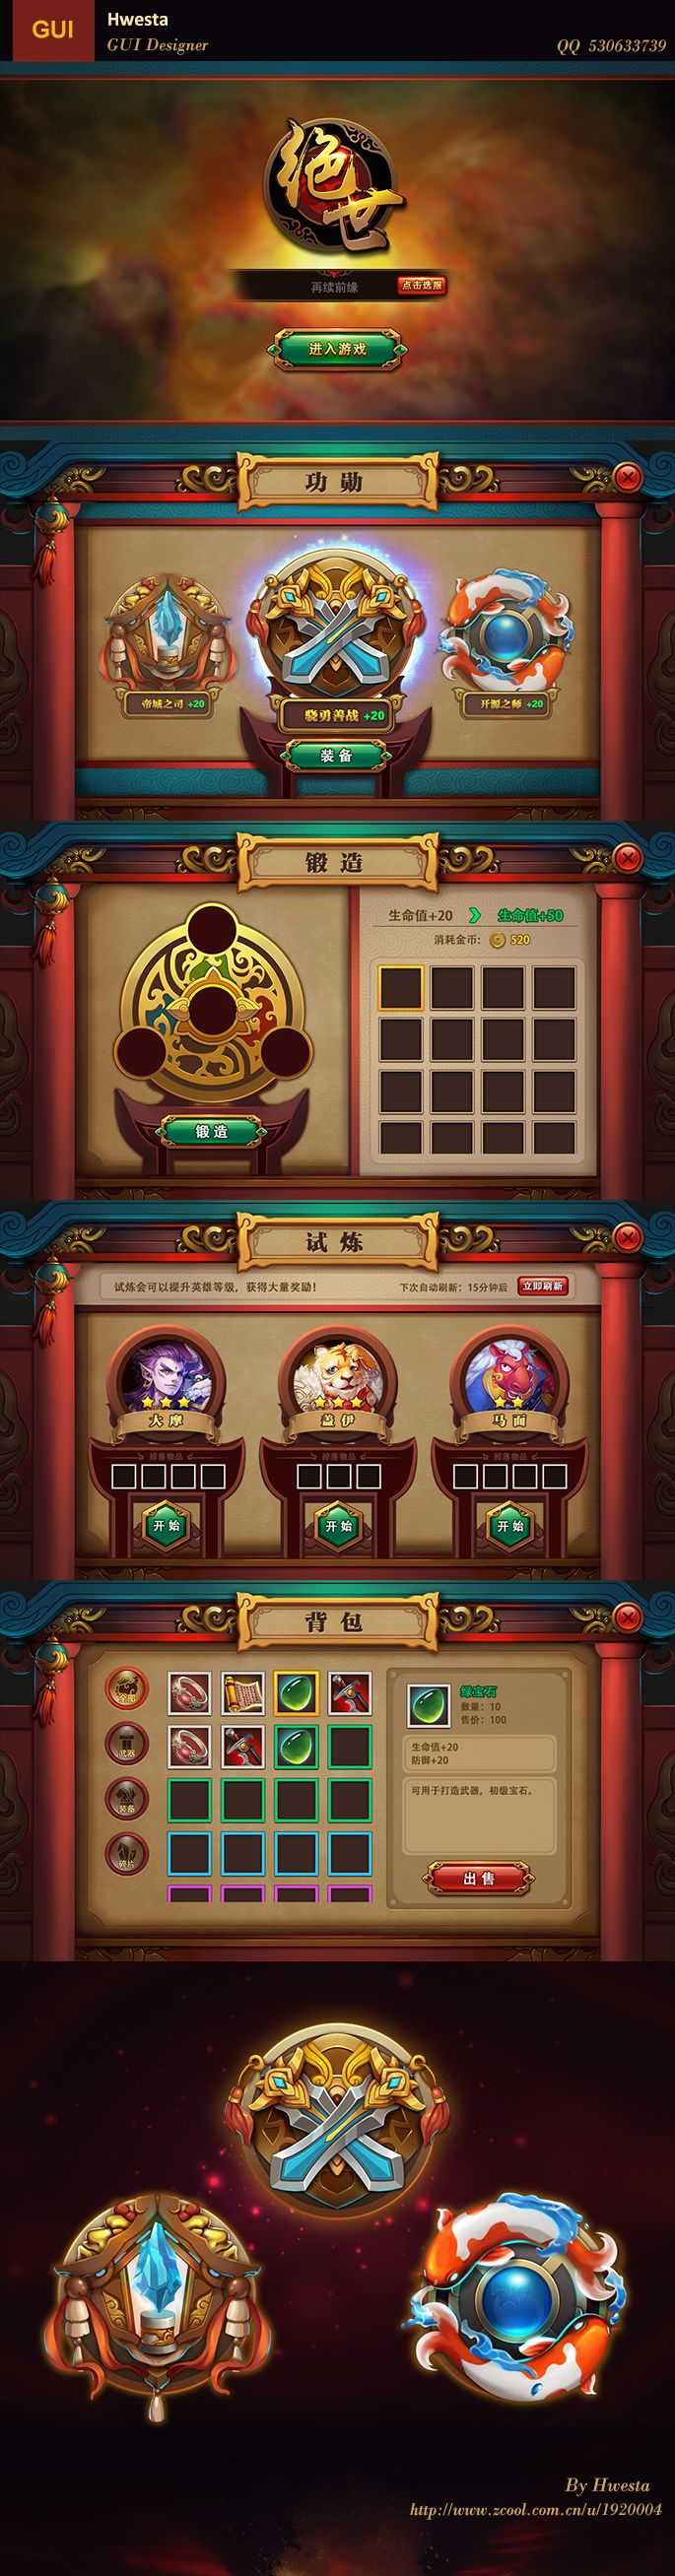 Peerless – China Wind practice game UI – GUI